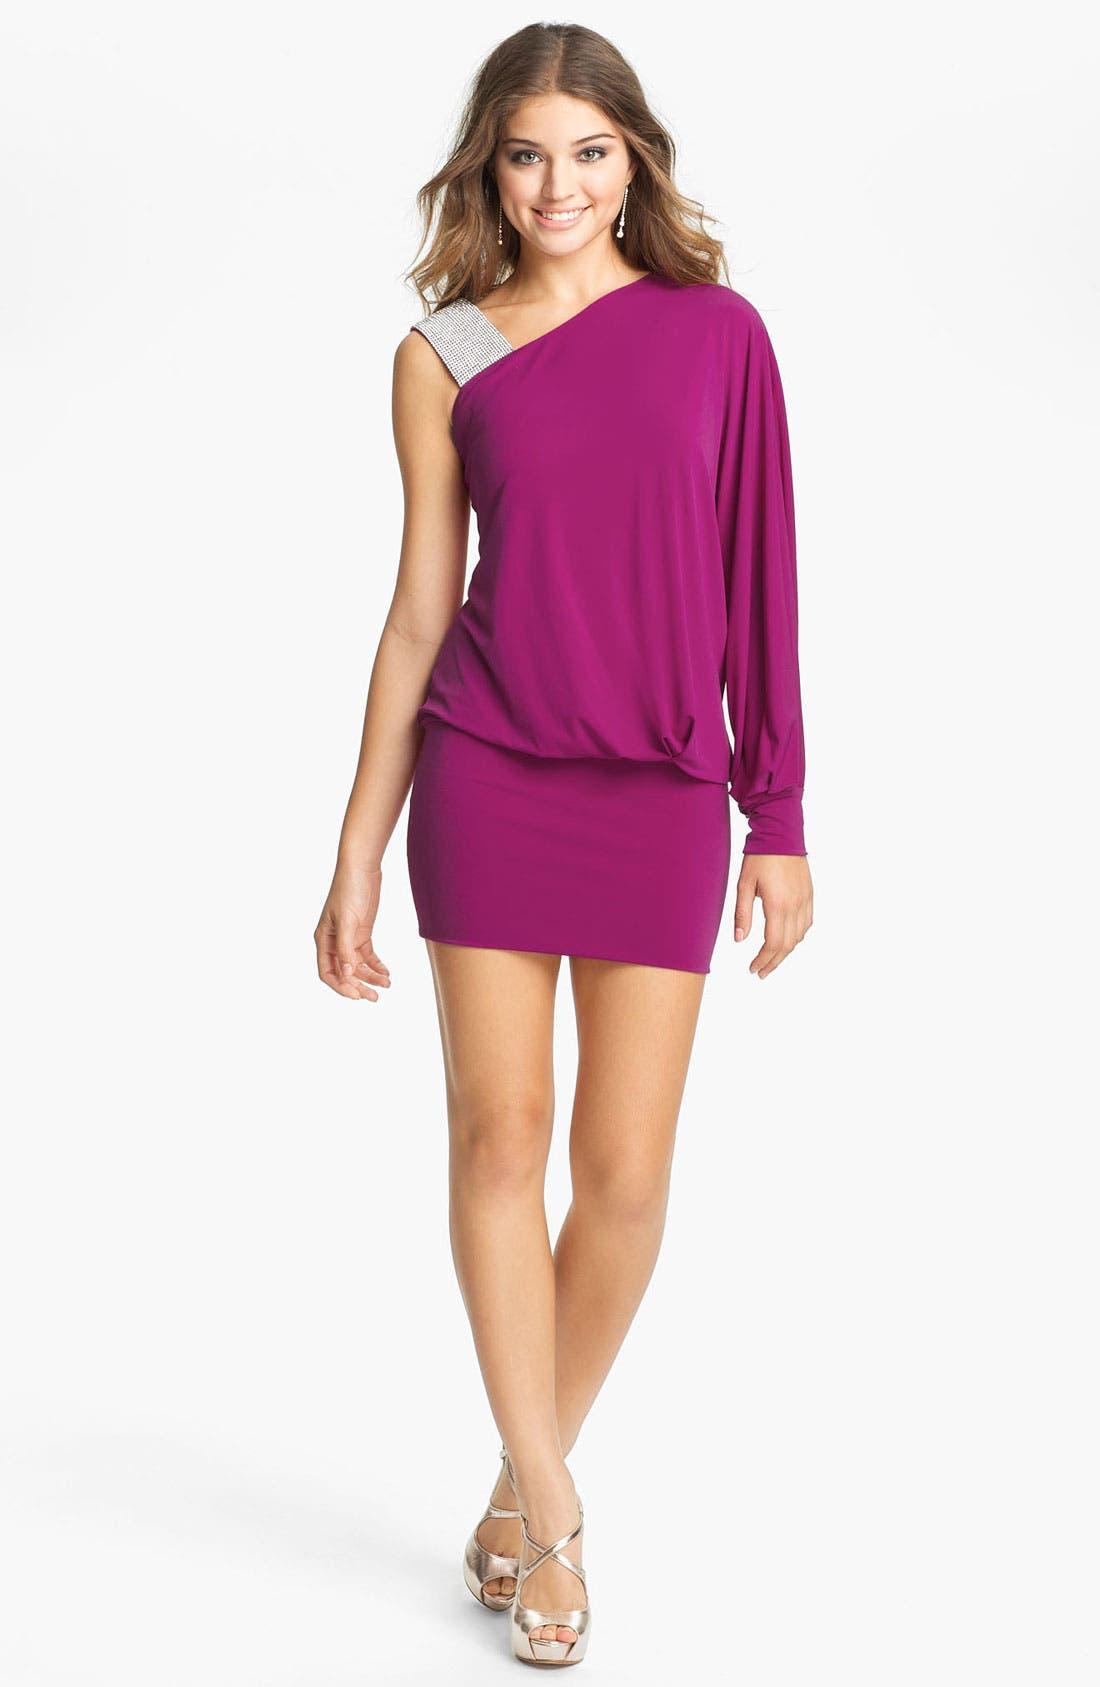 Alternate Image 1 Selected - Julian Joyce Embellished Strap One Sleeve Blouson Minidress